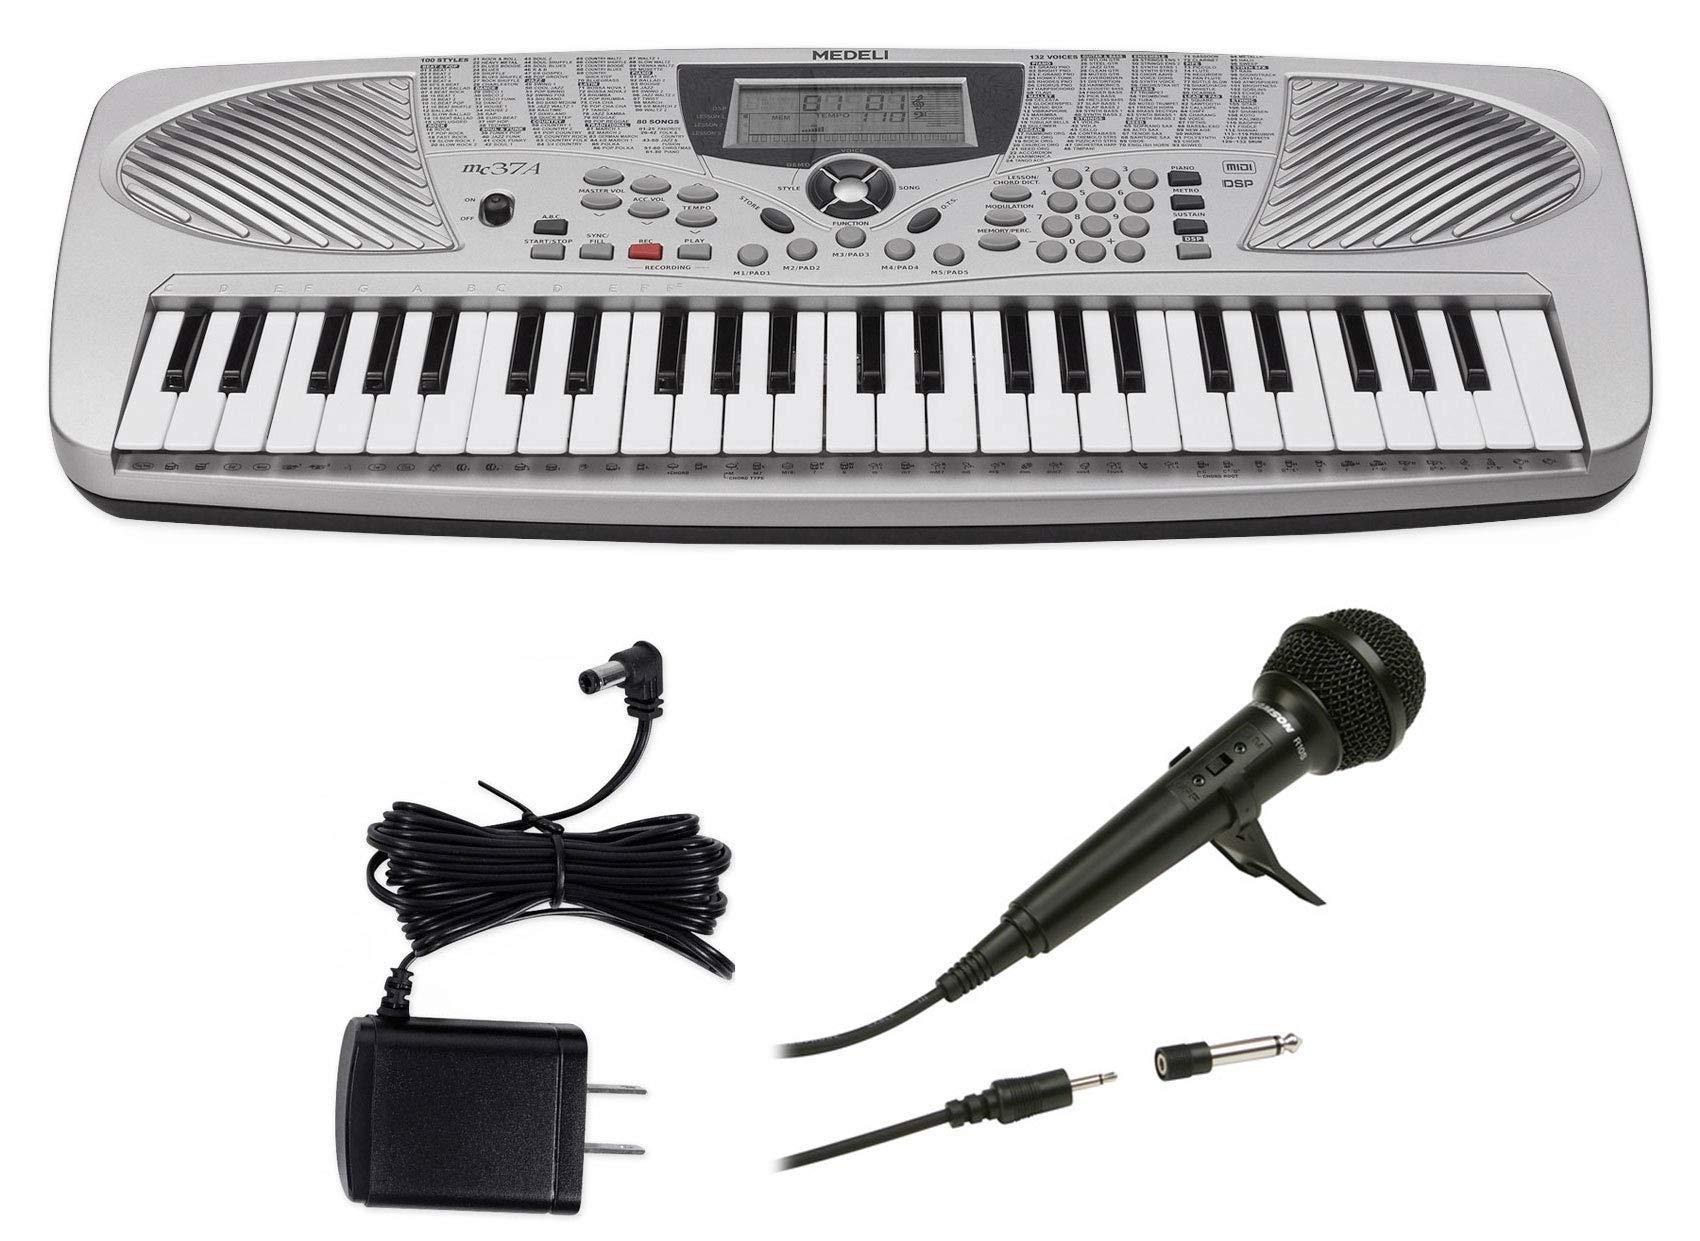 MEDELI MC37A 49-Key USB Portable Keyboard + Power Supply + Microphone by Medeli